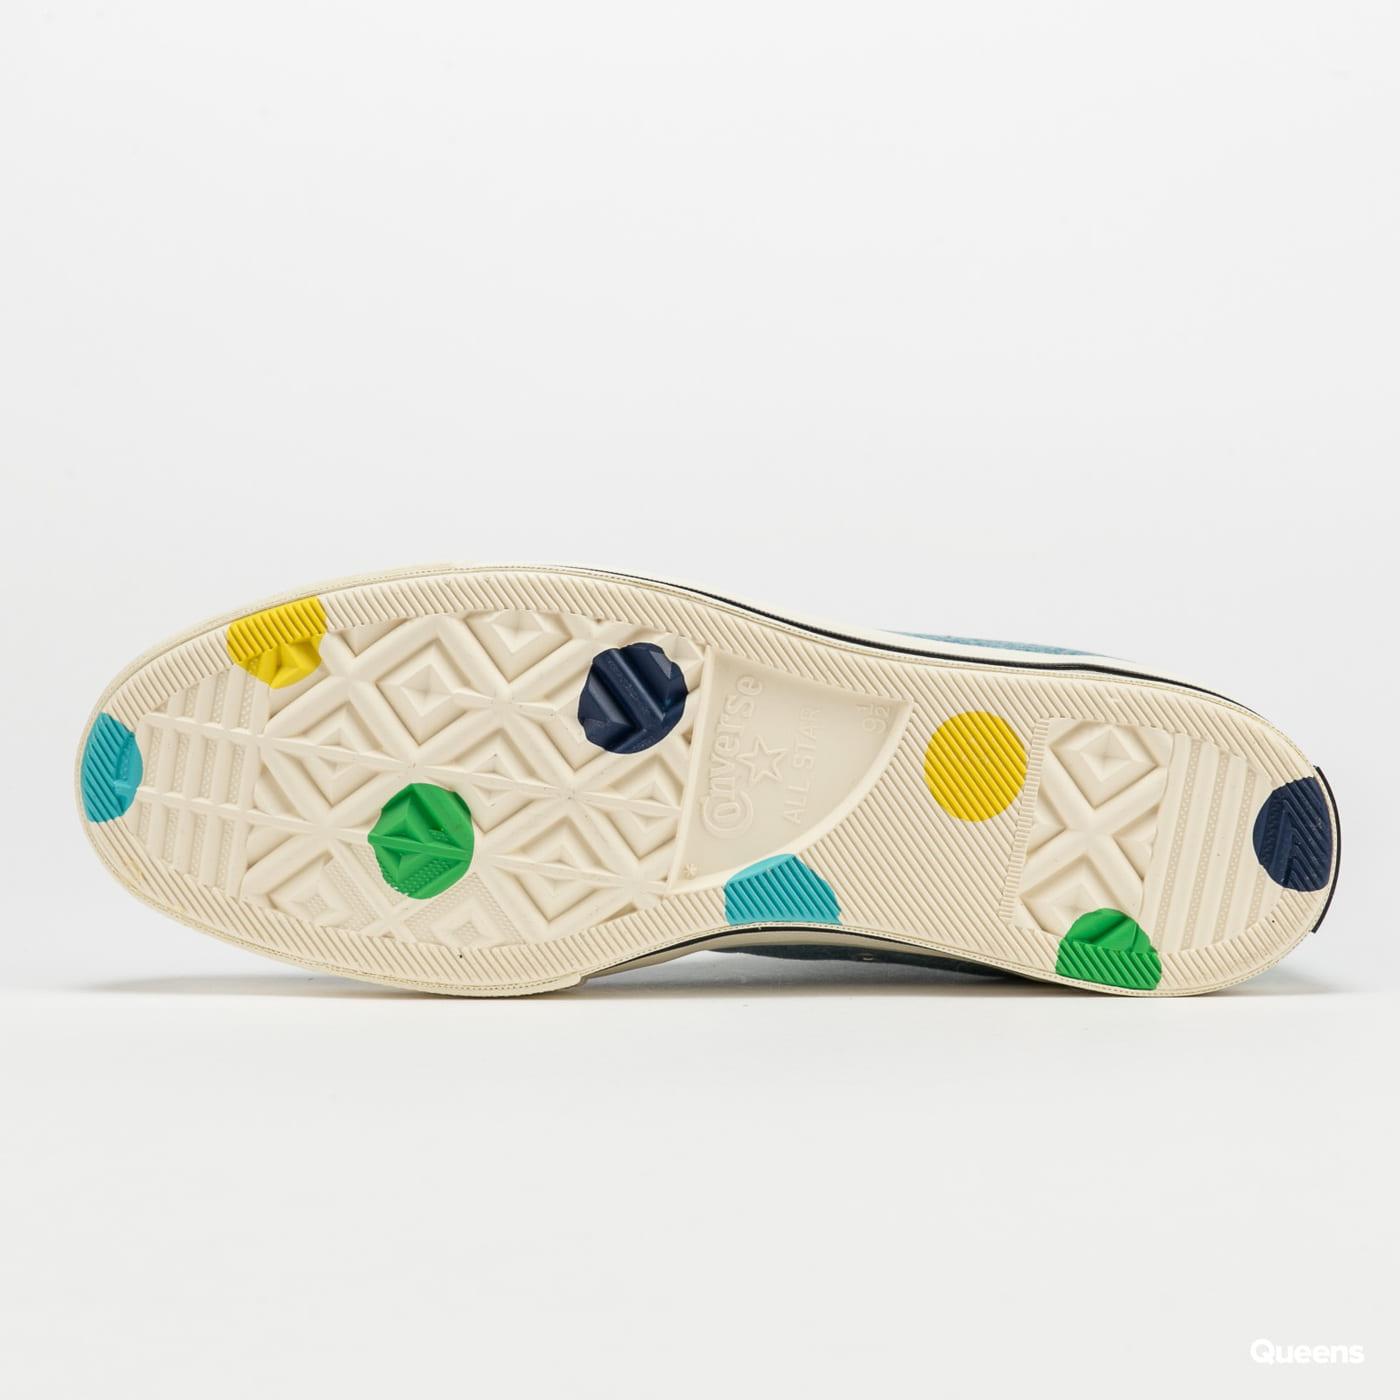 Converse Chuck 70 Hi - Golf Wang Polka Dot blue / egret / black